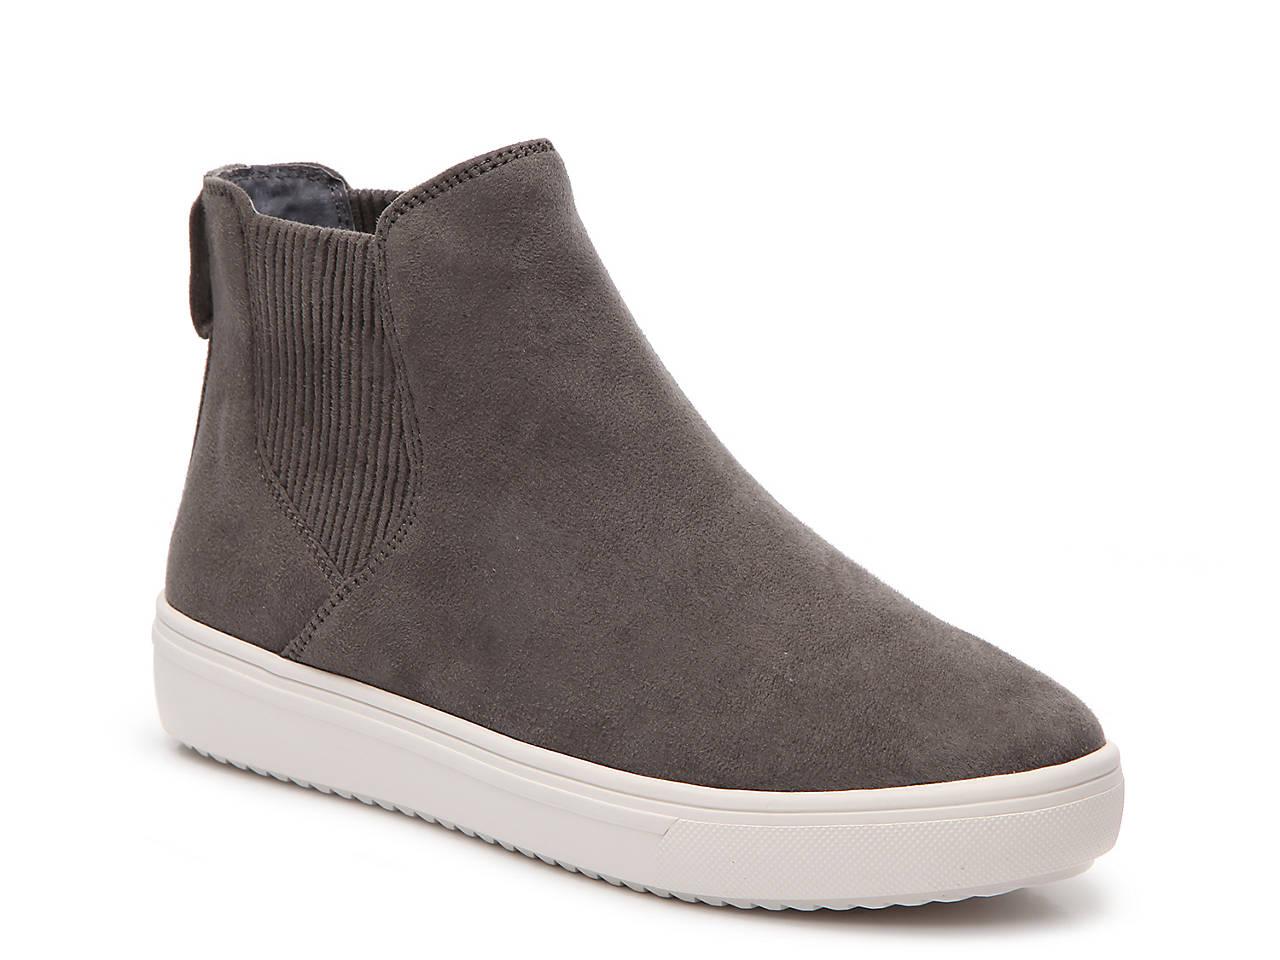 e292704fa282 Steven by Steve Madden Coal High-Top Sneaker Men s Shoes